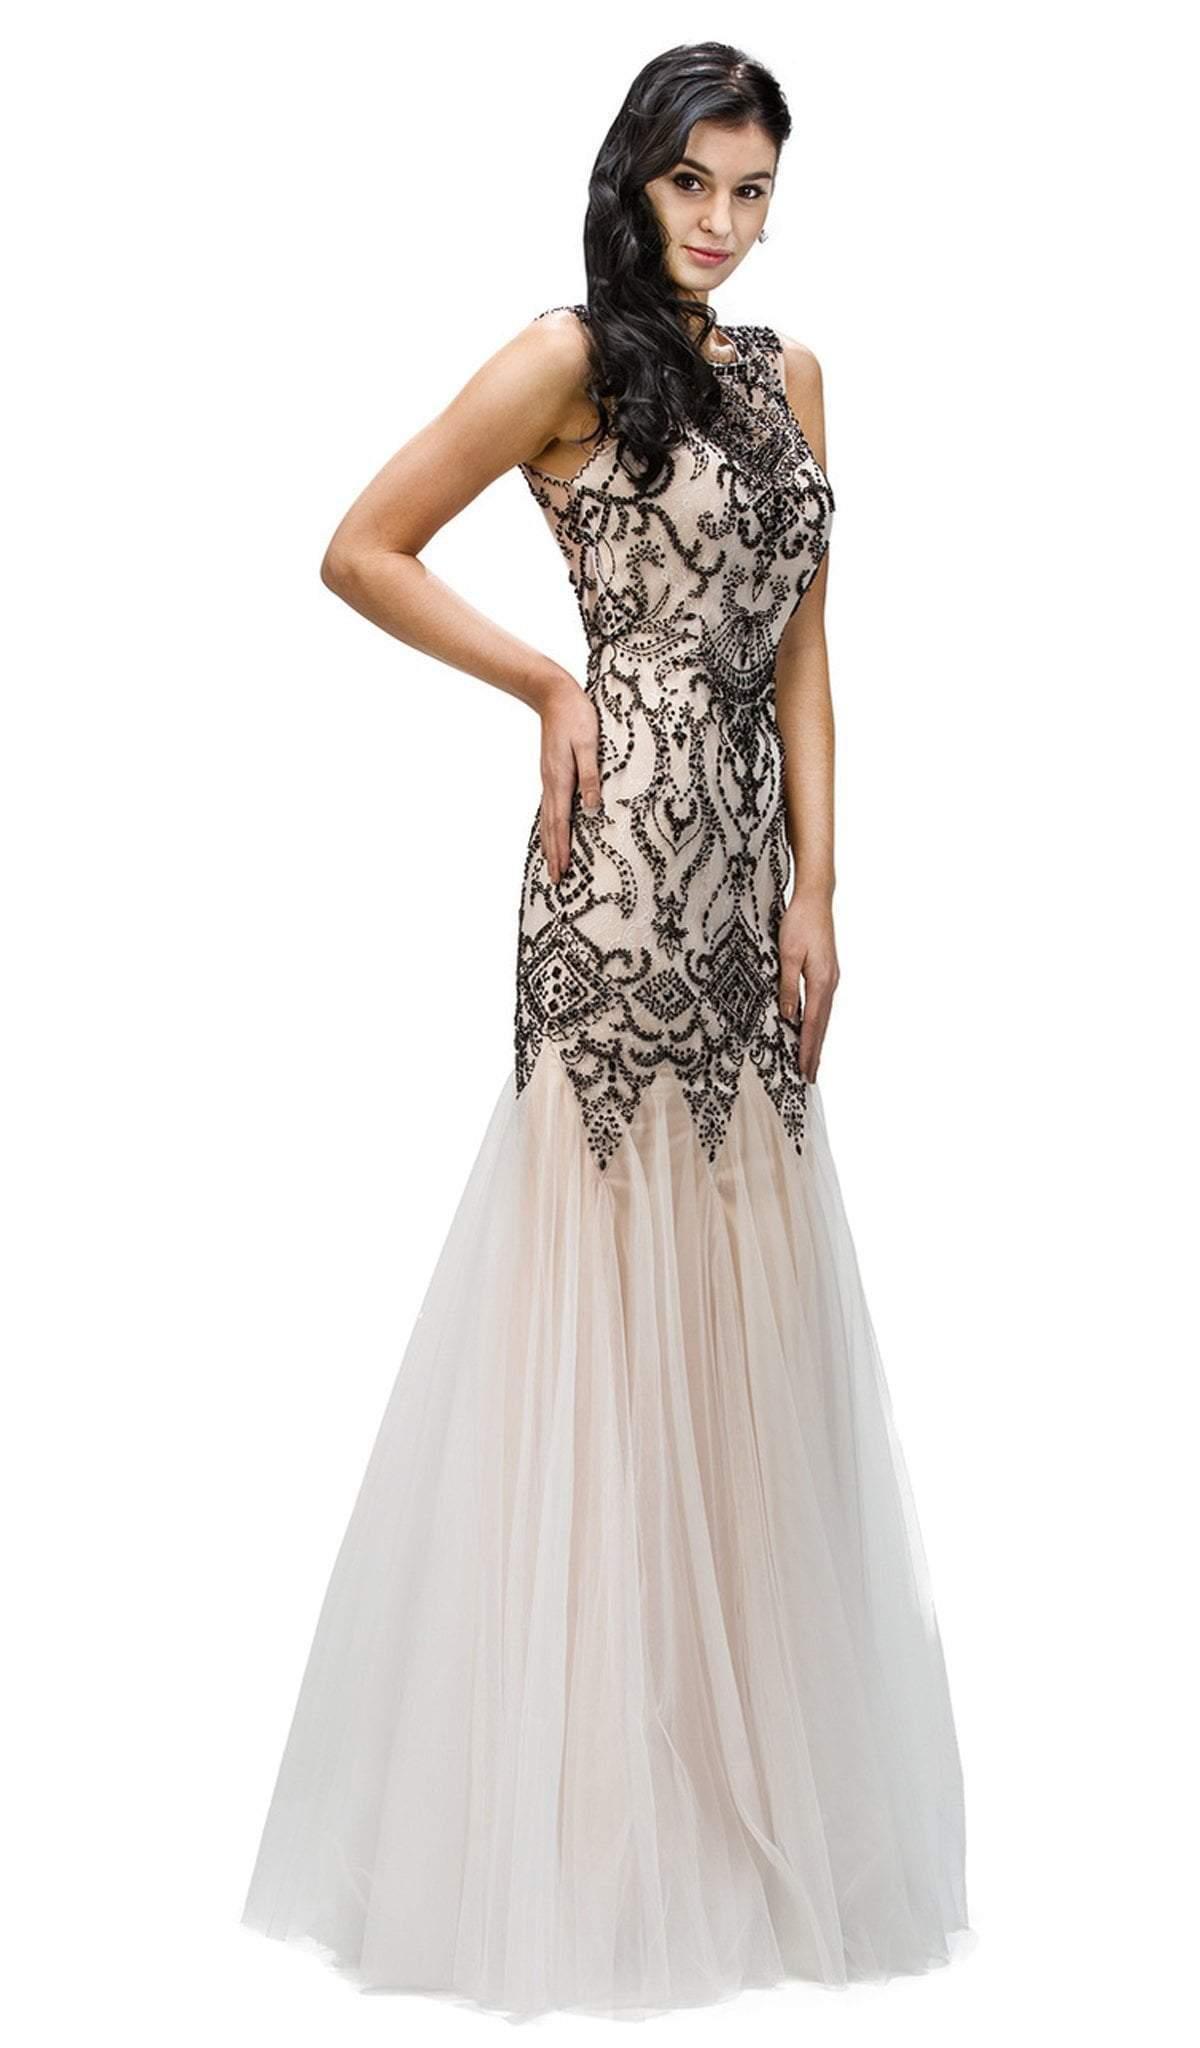 Dancing Queen - 9294 Beaded Godet Inset Mermaid Prom Dress